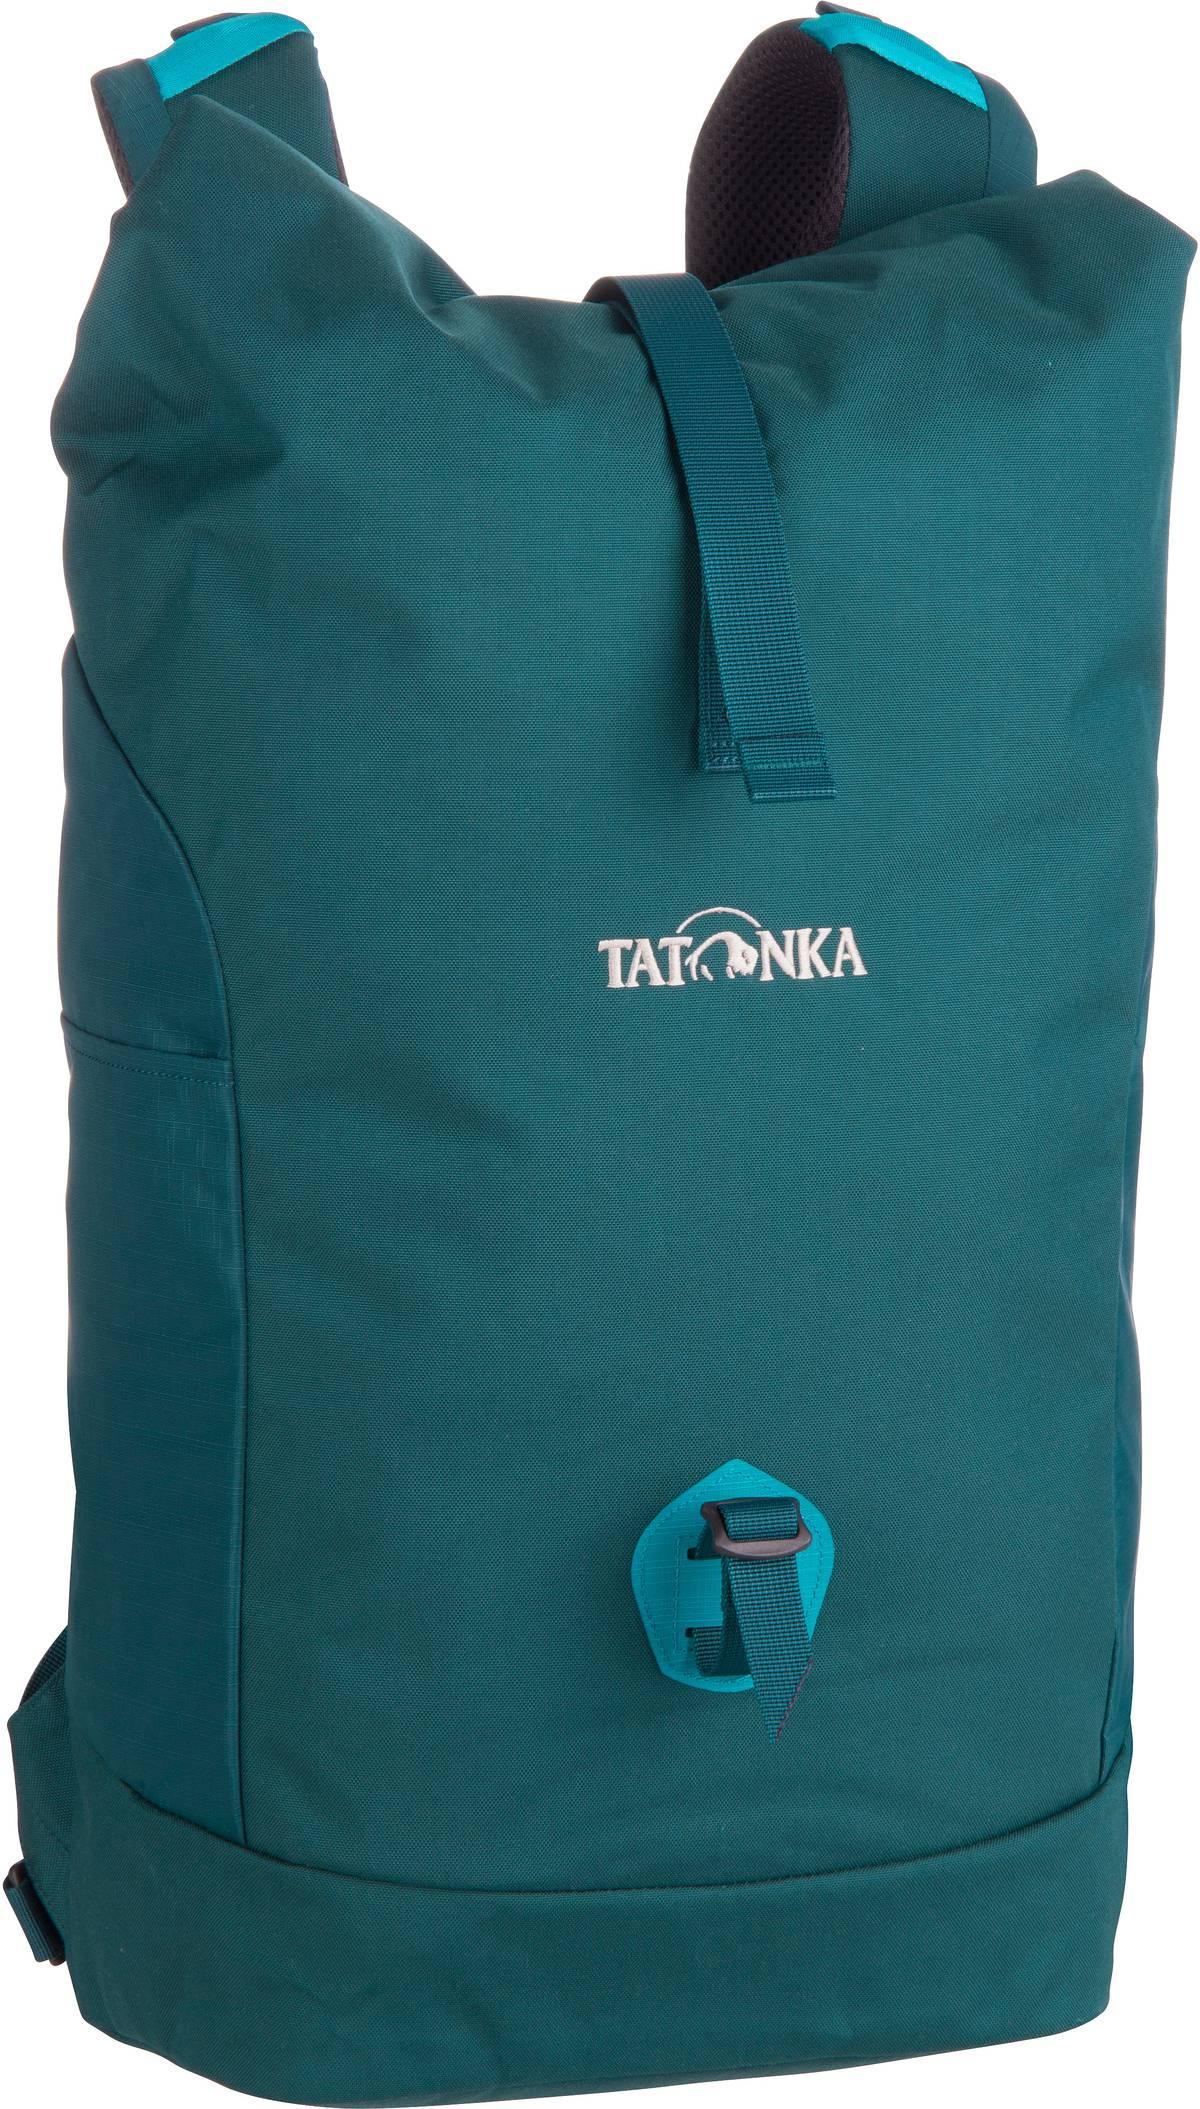 Rucksack / Daypack Grip Rolltop Pack S Teal Green (25 Liter)